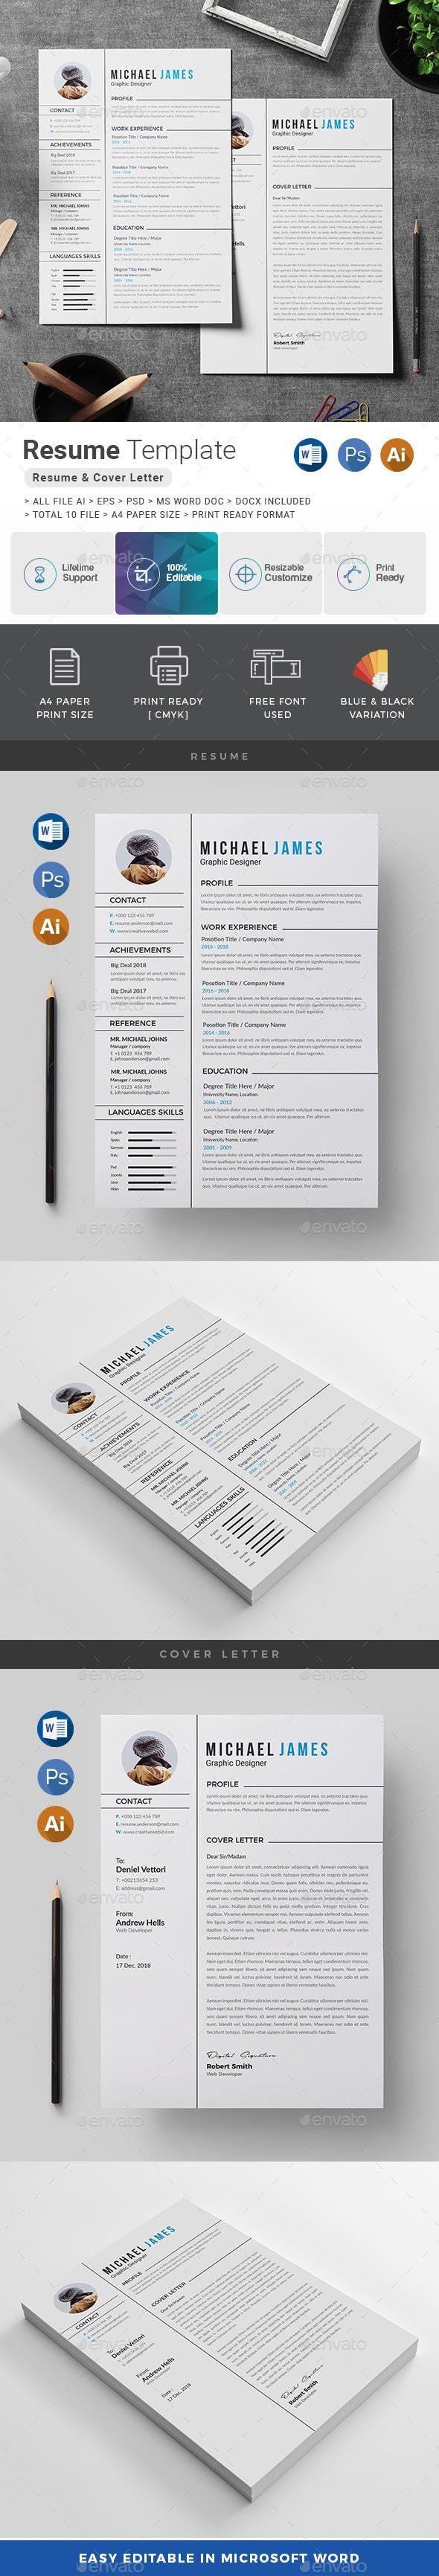 Resume Template PSD, Vector EPS, AI, DOC & DOCX Simple